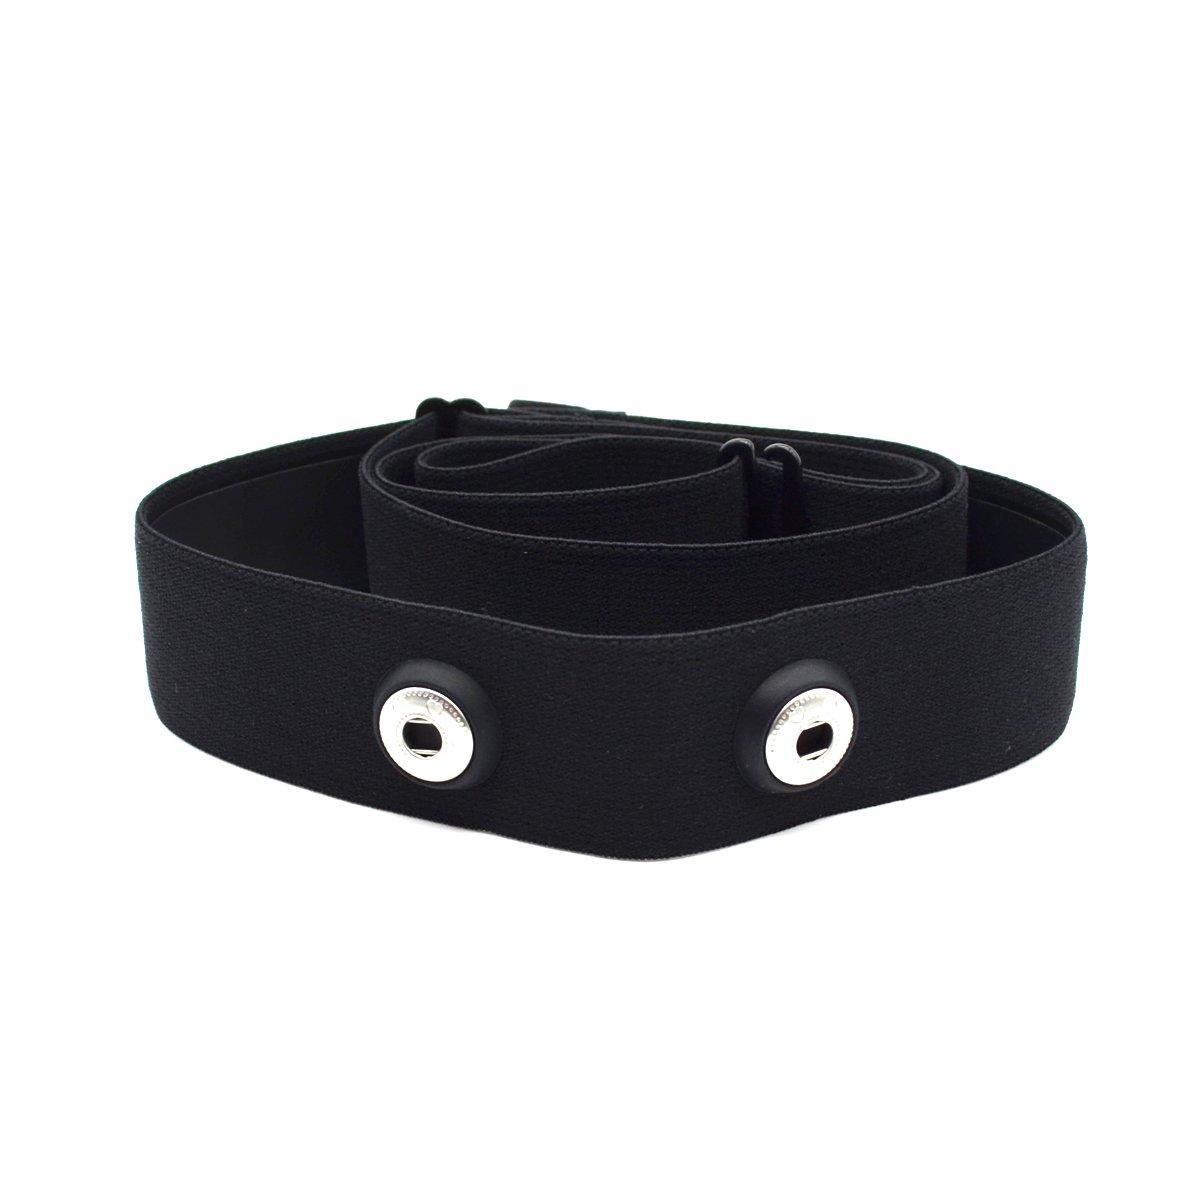 Cinghia per cardiofrequenzimetro Garmin, Wahoo e Polar, regolabile, da posizionare sul petto, ideale per sport e fitness, CooSpo Original HRM Belt Black product image